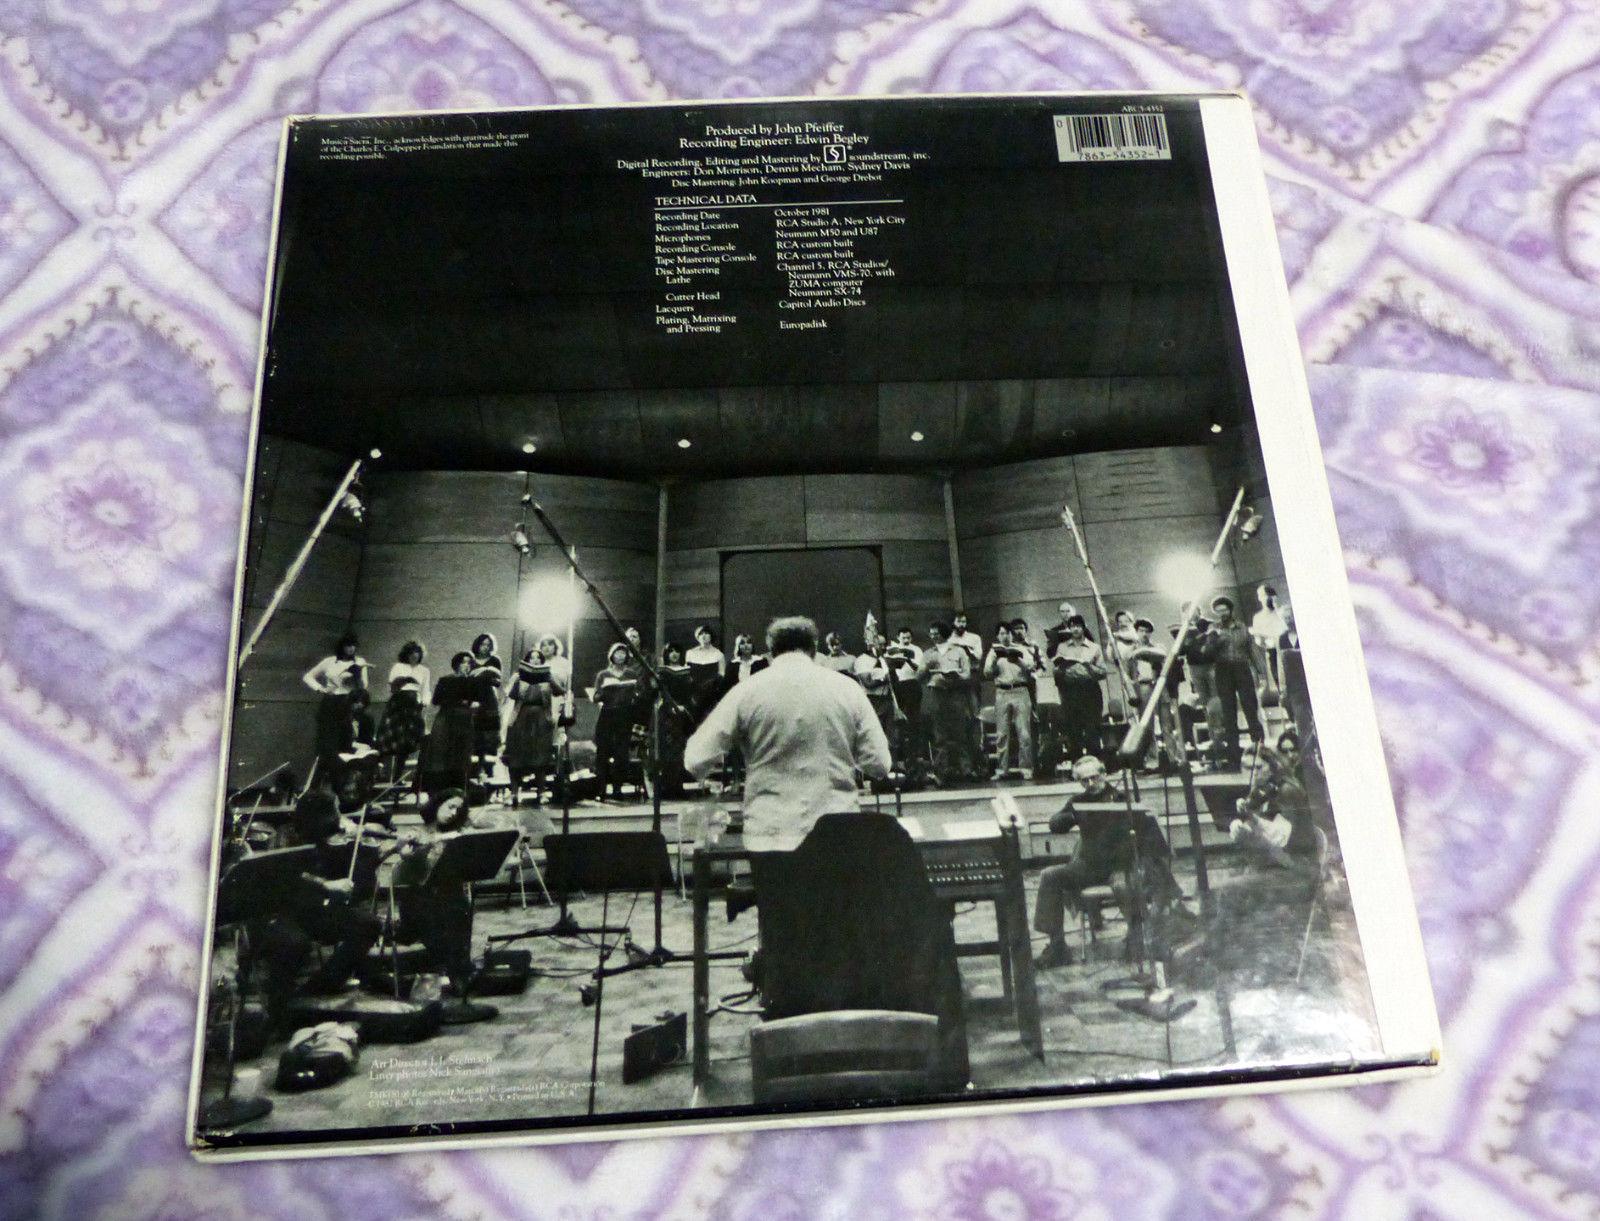 HANDEL: Messiah 3LP  Musica Sacra/Richard Westenburg Audiophile NY Ed 1 Pressing